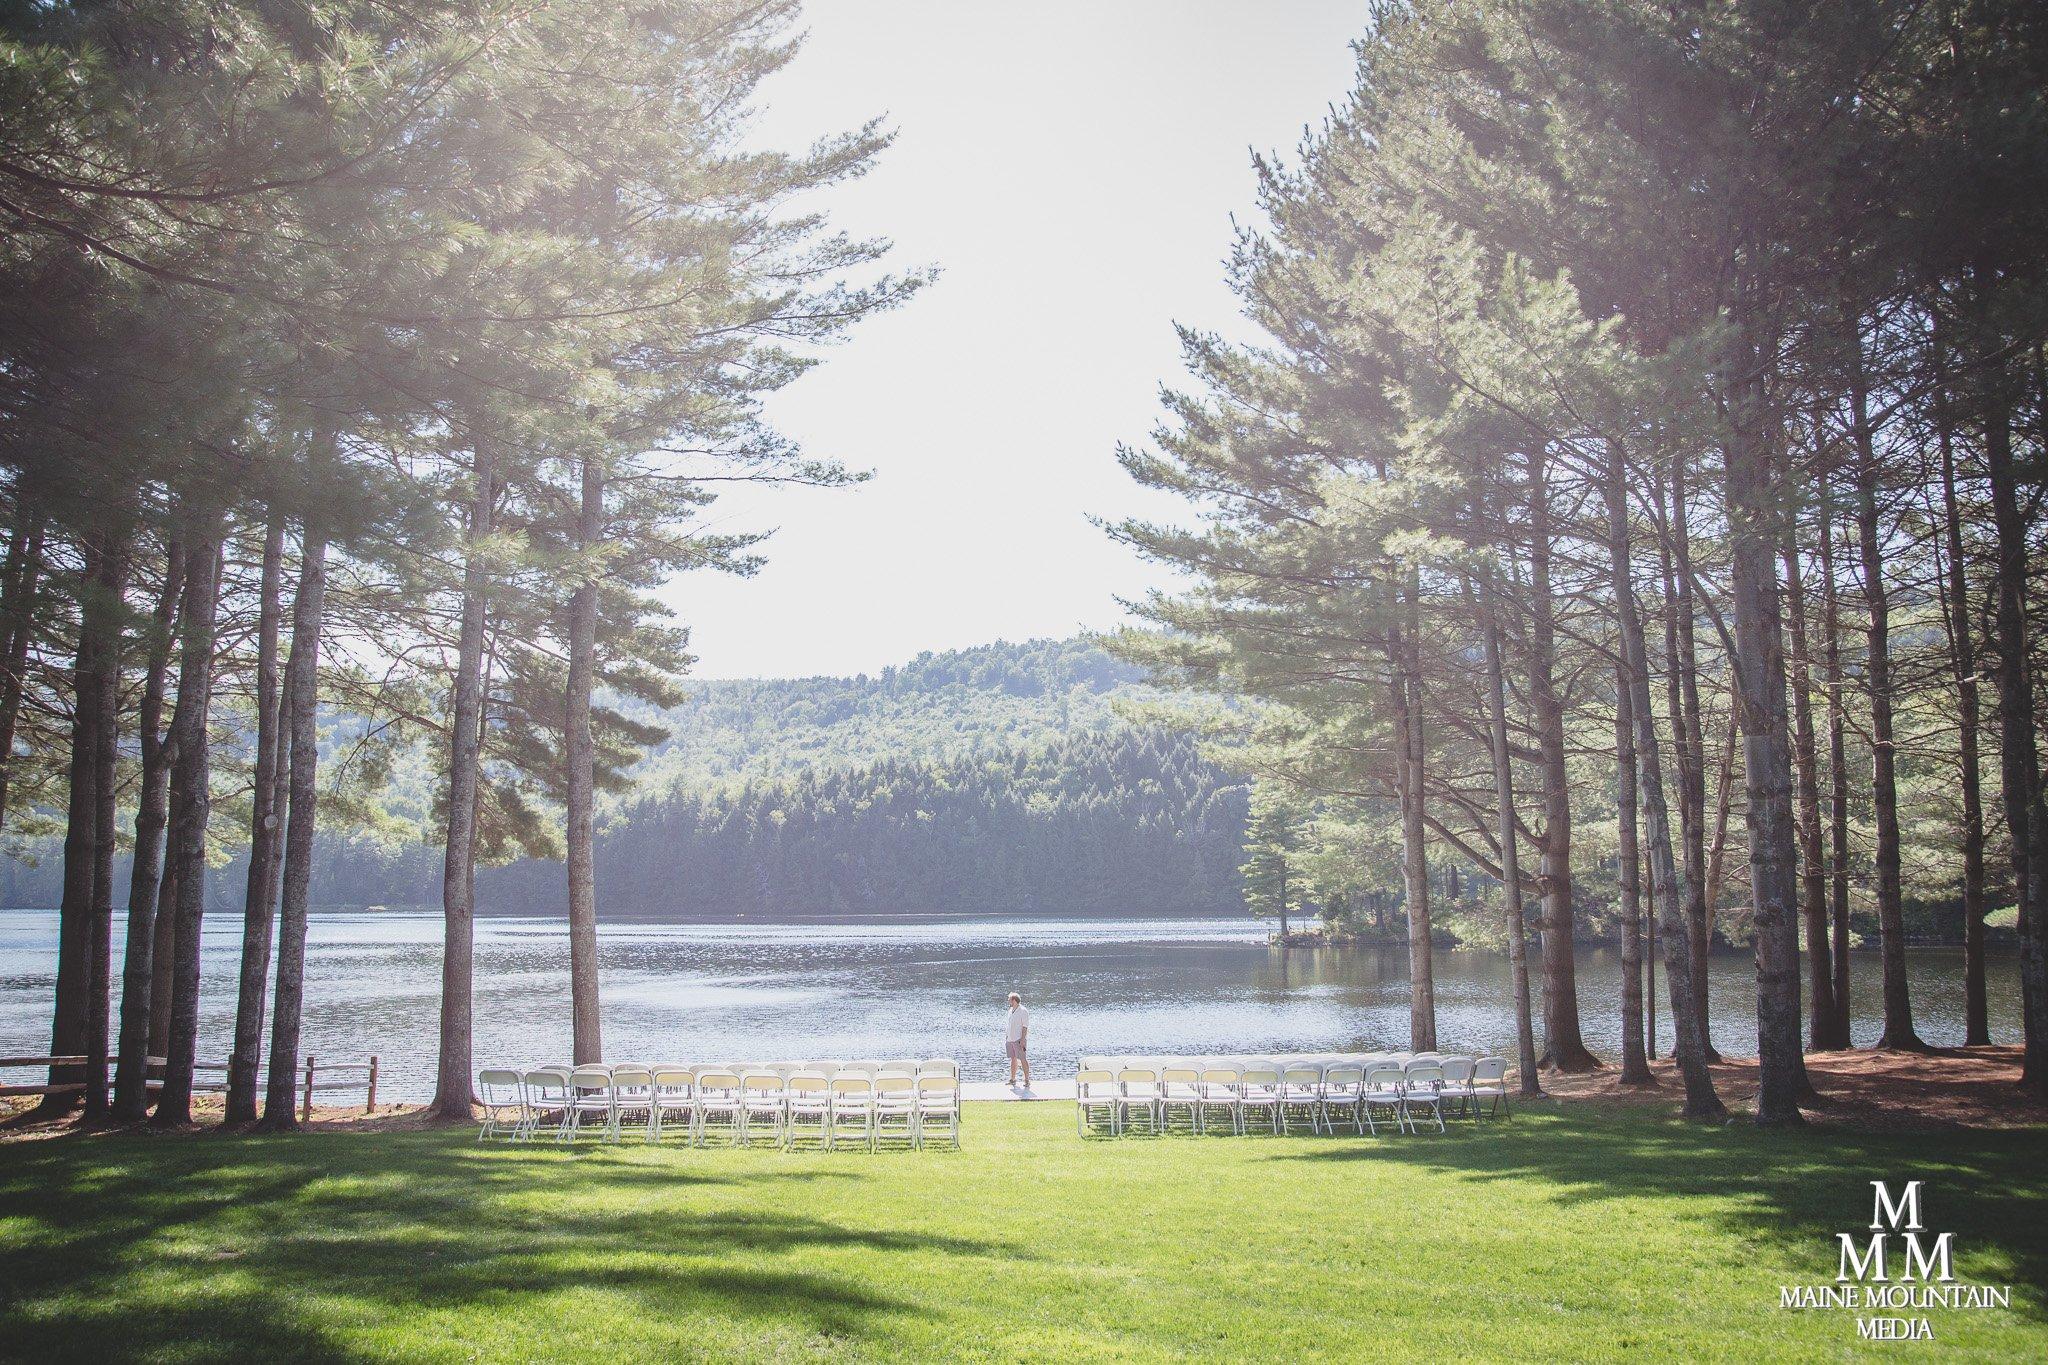 Nestled among the pines on Wyman Lake